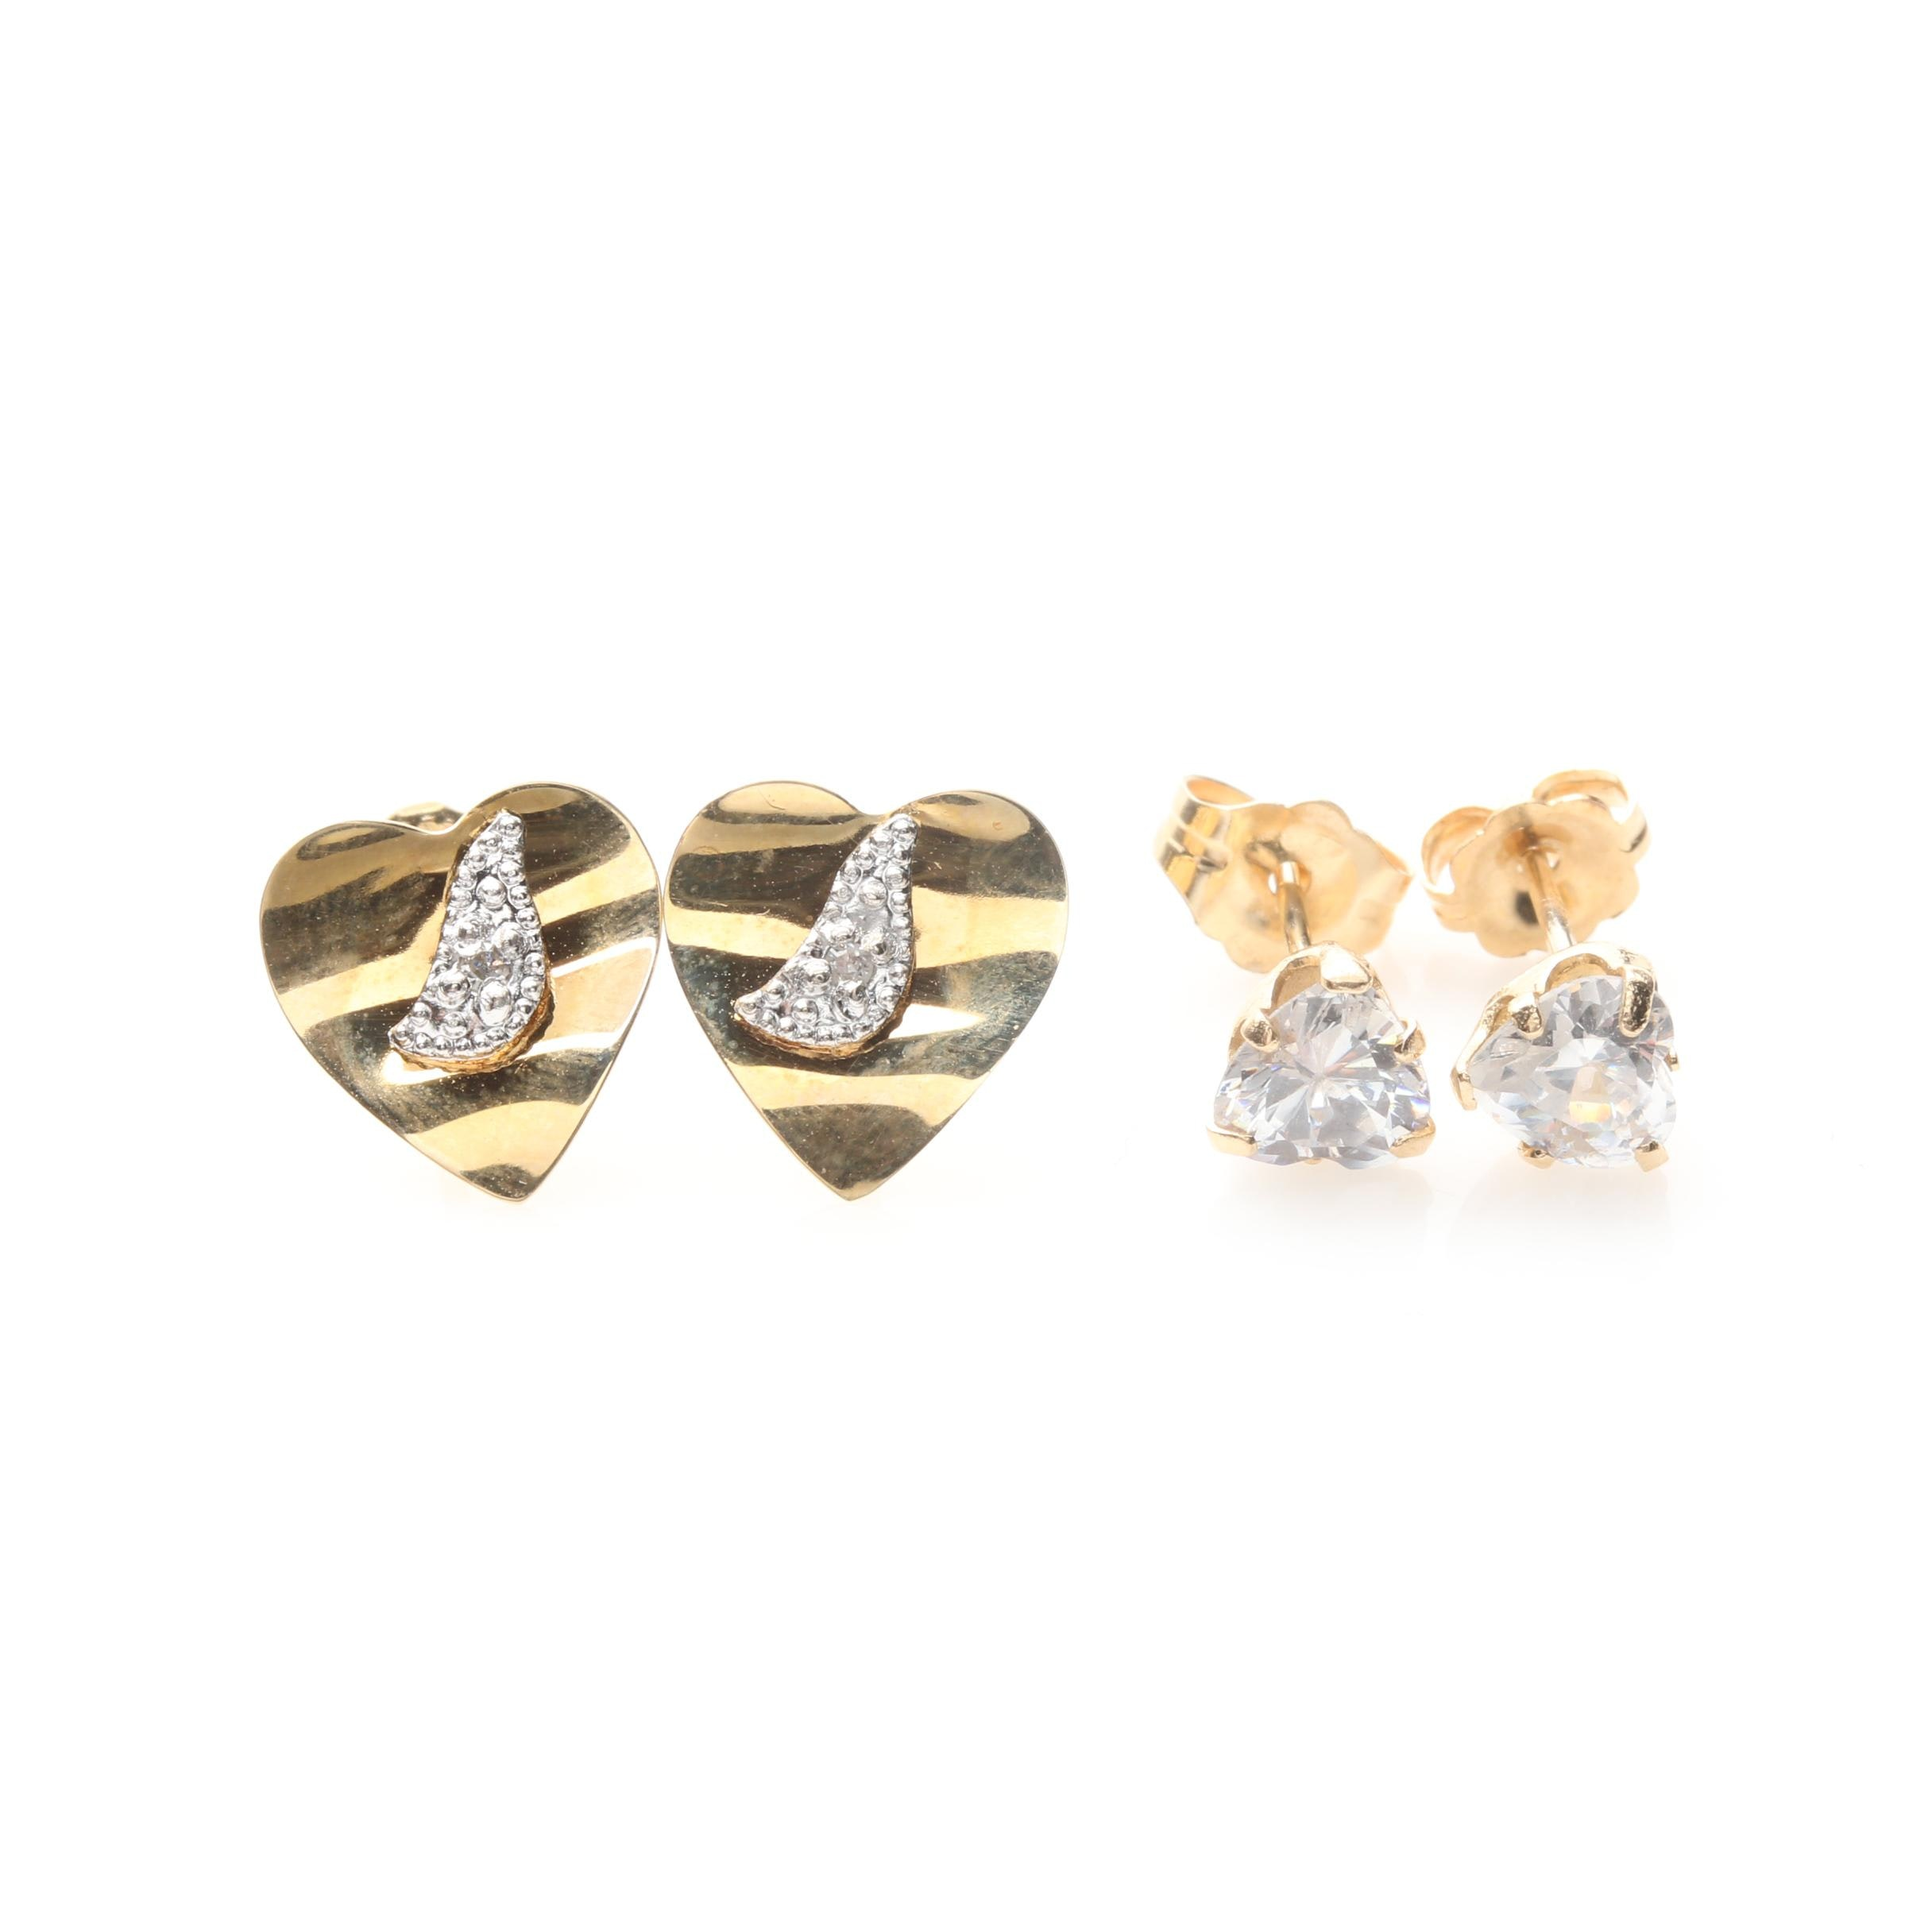 14K Yellow Gold Diamond and Cubic Zirconia Stud Earring Selection